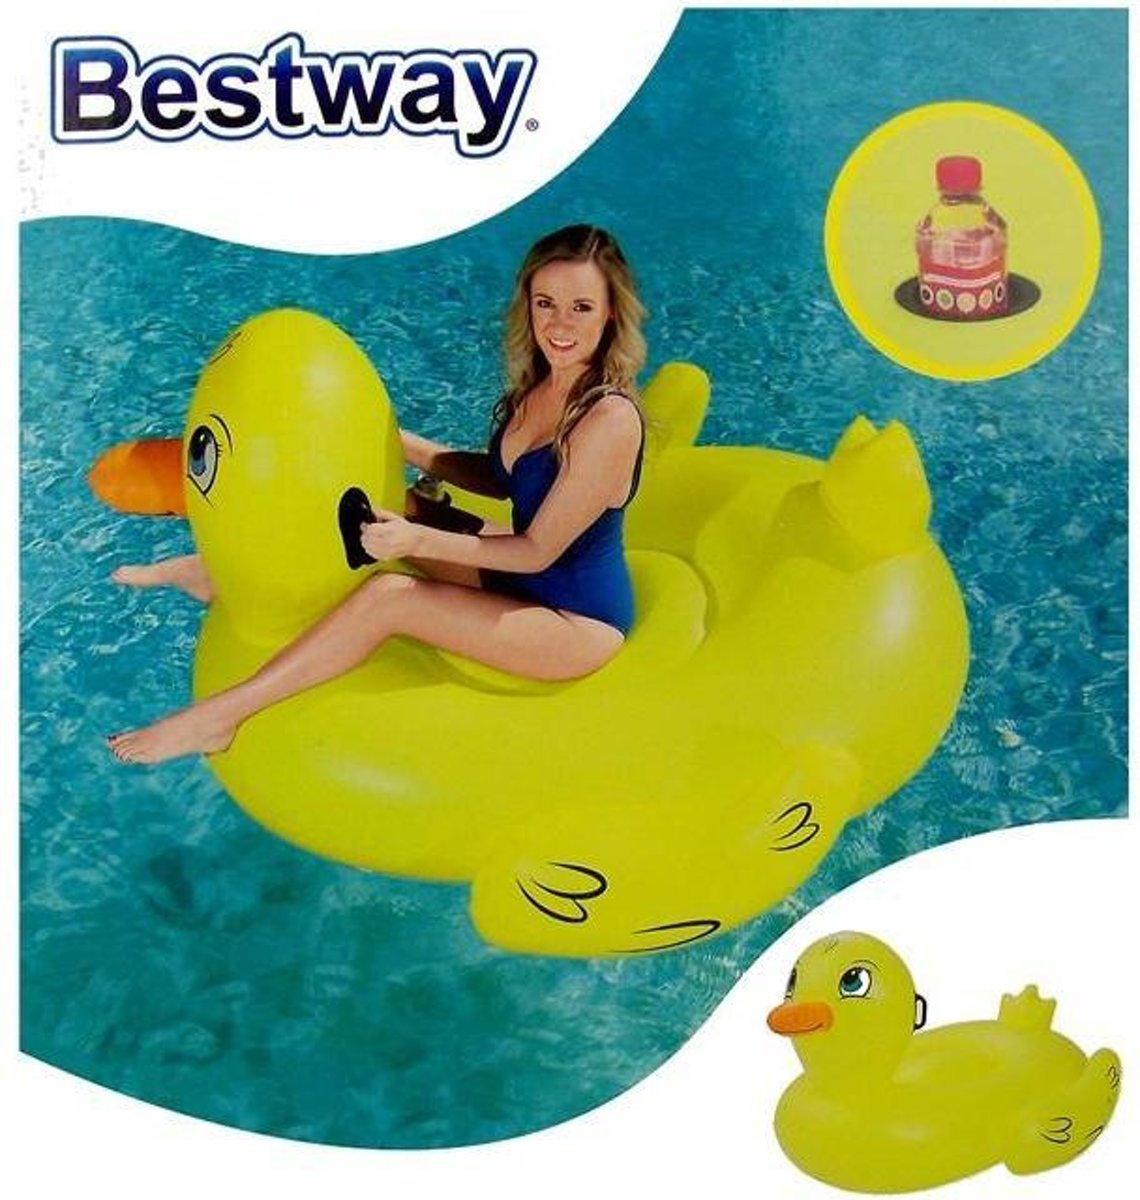 Bestway Opblaasbare eend XL